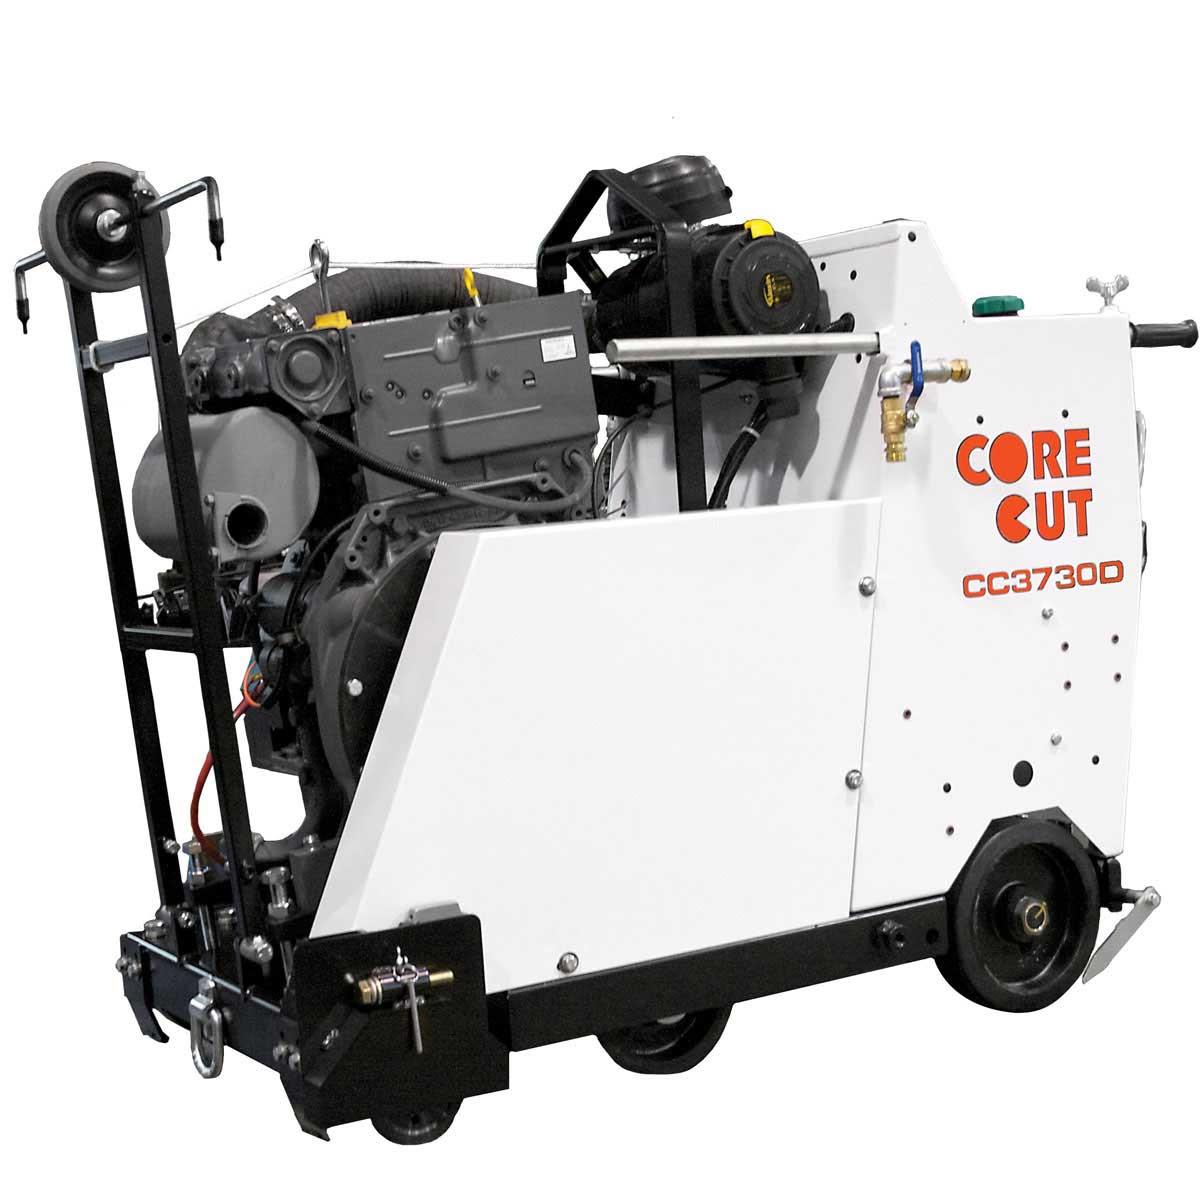 Core Cut concrete flat saw motor